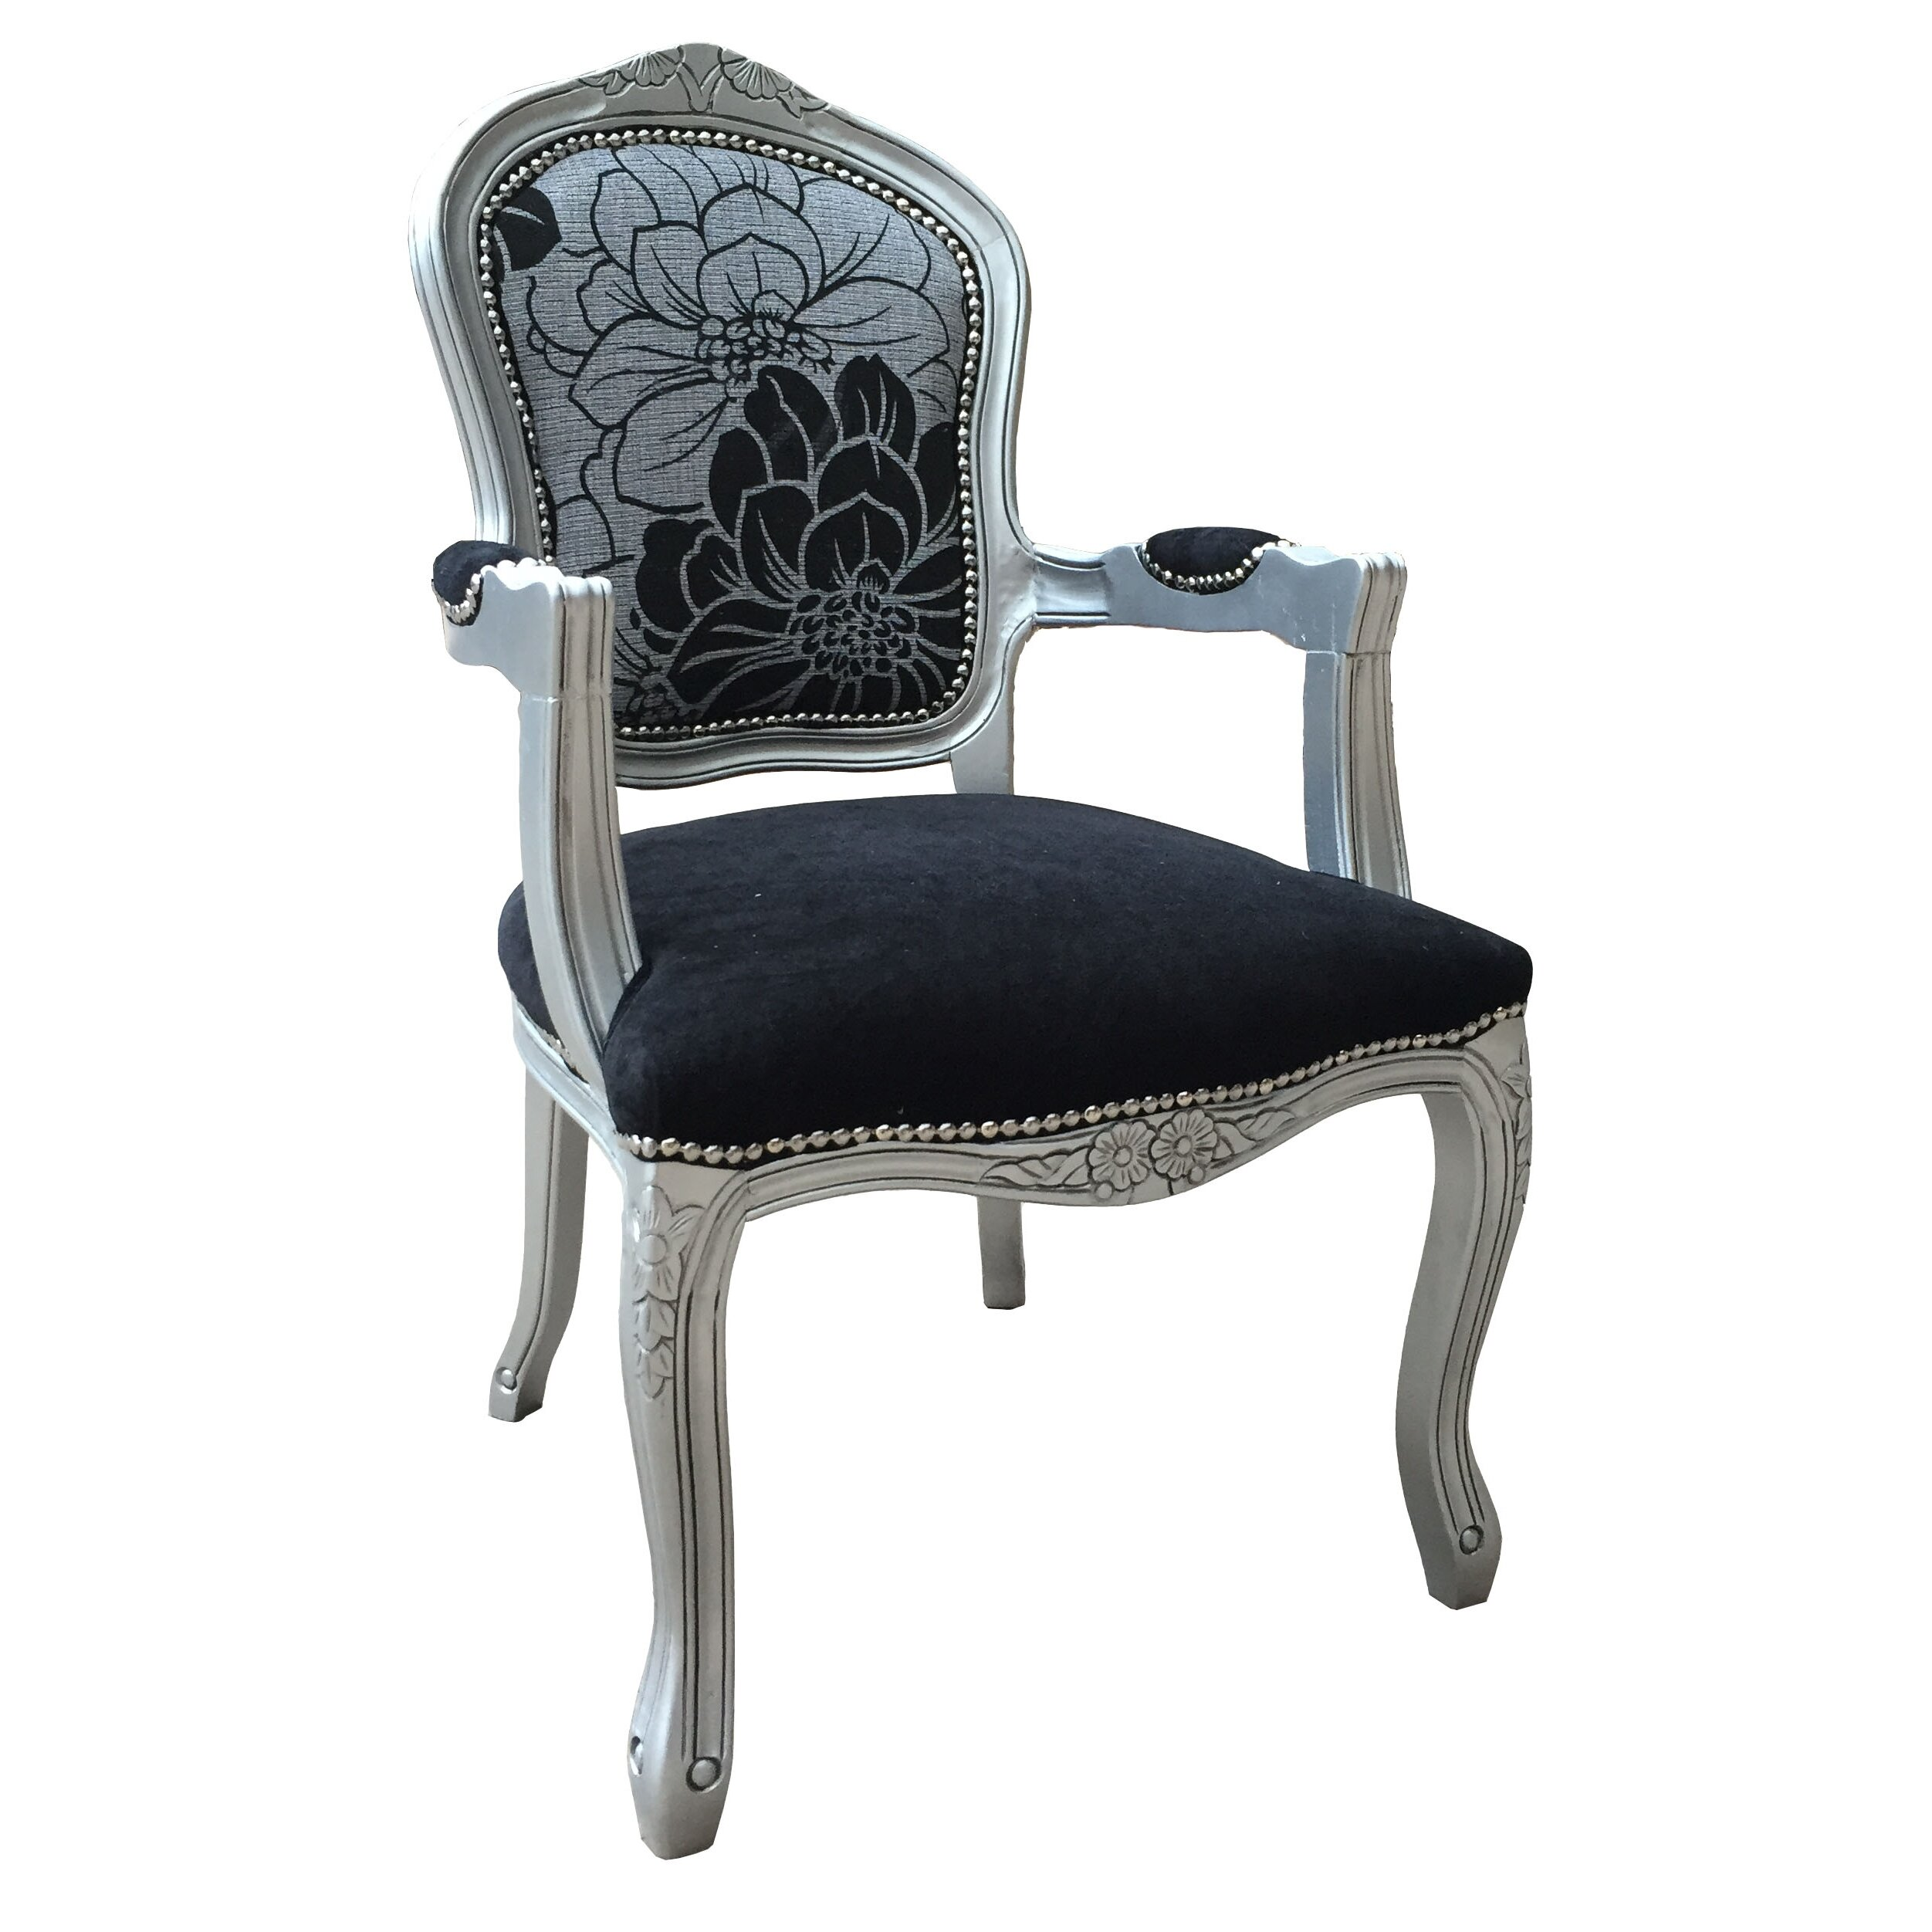 Derry S Louis Dining Chair Amp Reviews Wayfair Uk